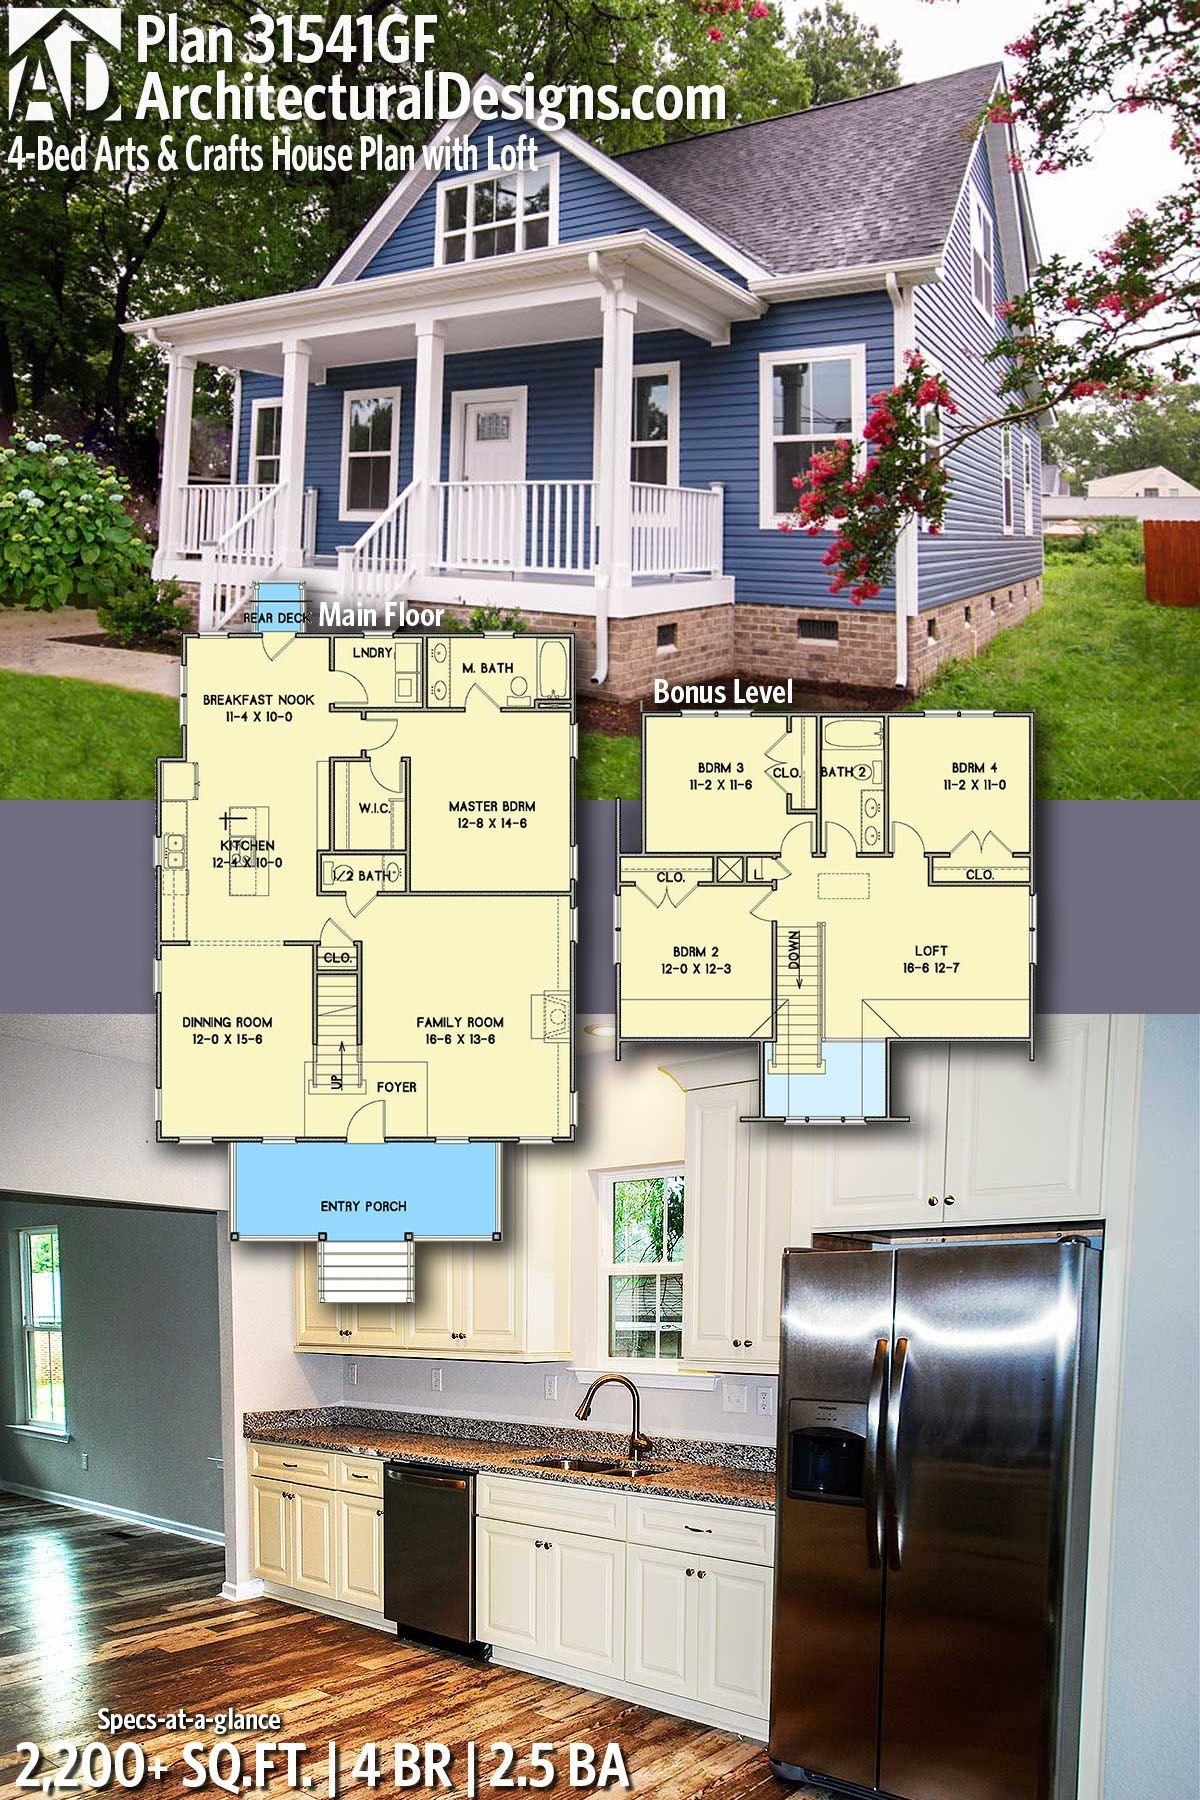 Plywood loft bed plans  Plan GF Bed Arts u Crafts House Plan with Loft  Blue print